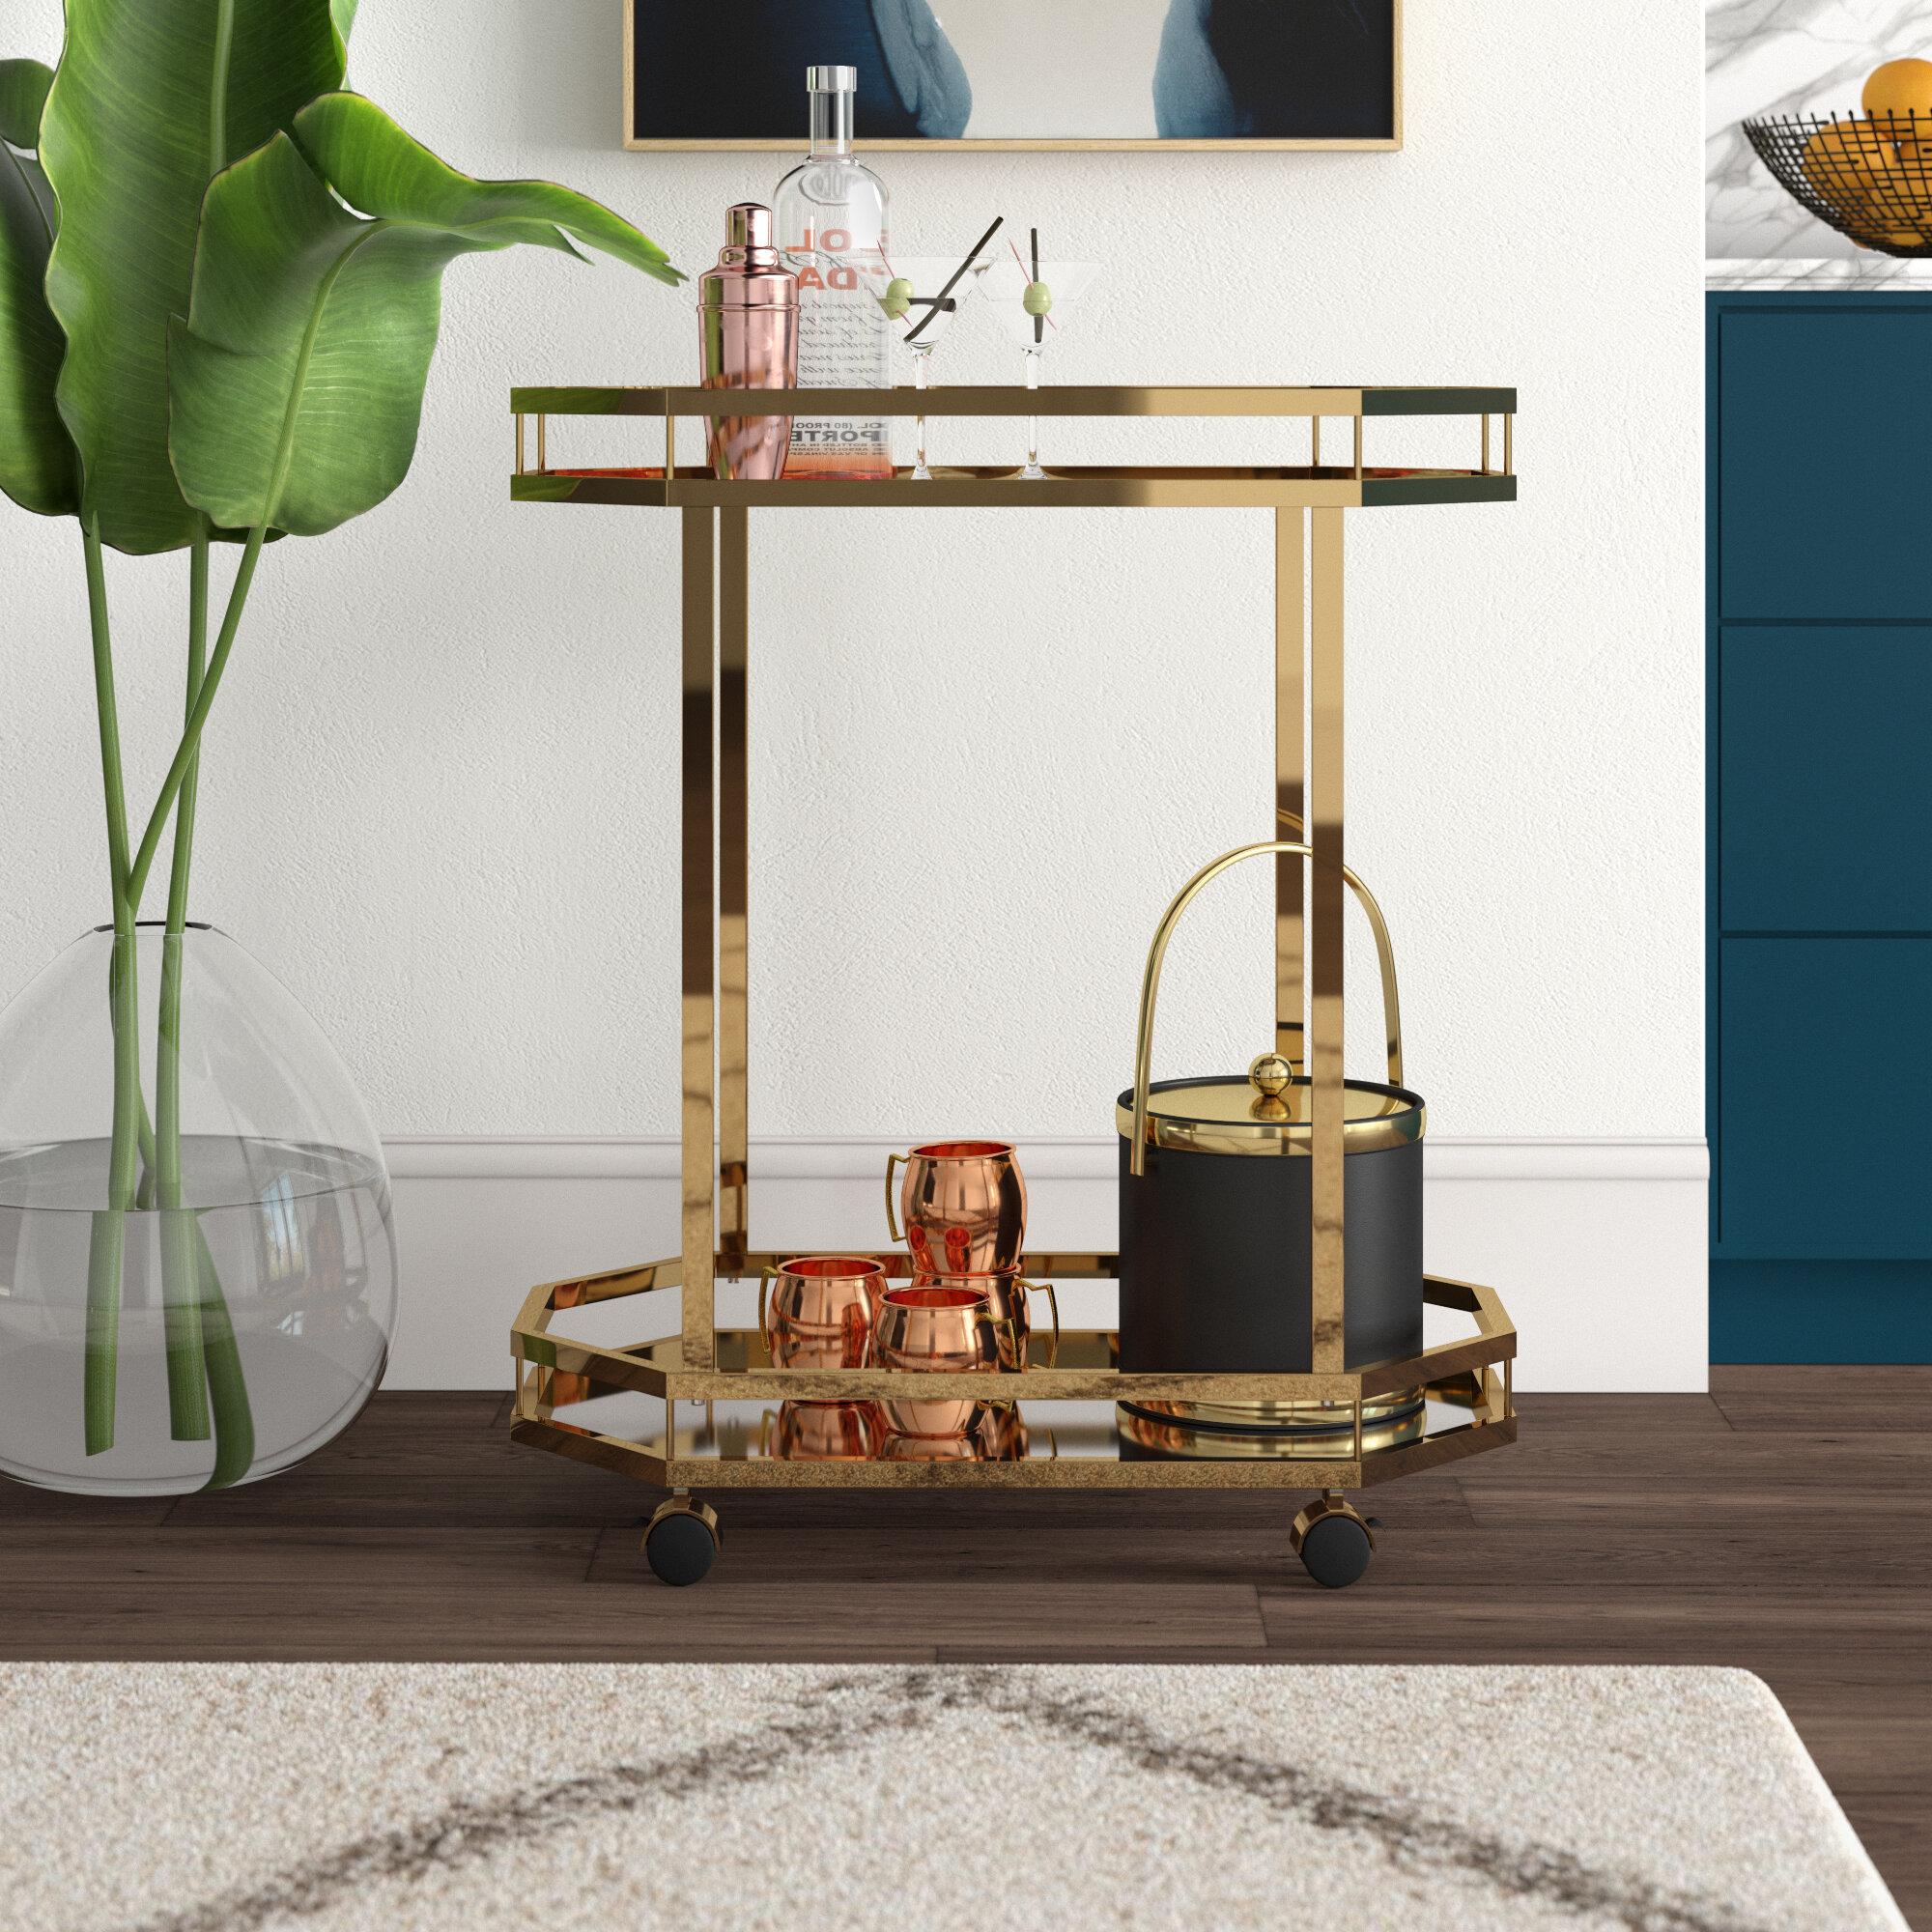 Wayfair Modern Contemporary Bar Carts You Ll Love In 2021